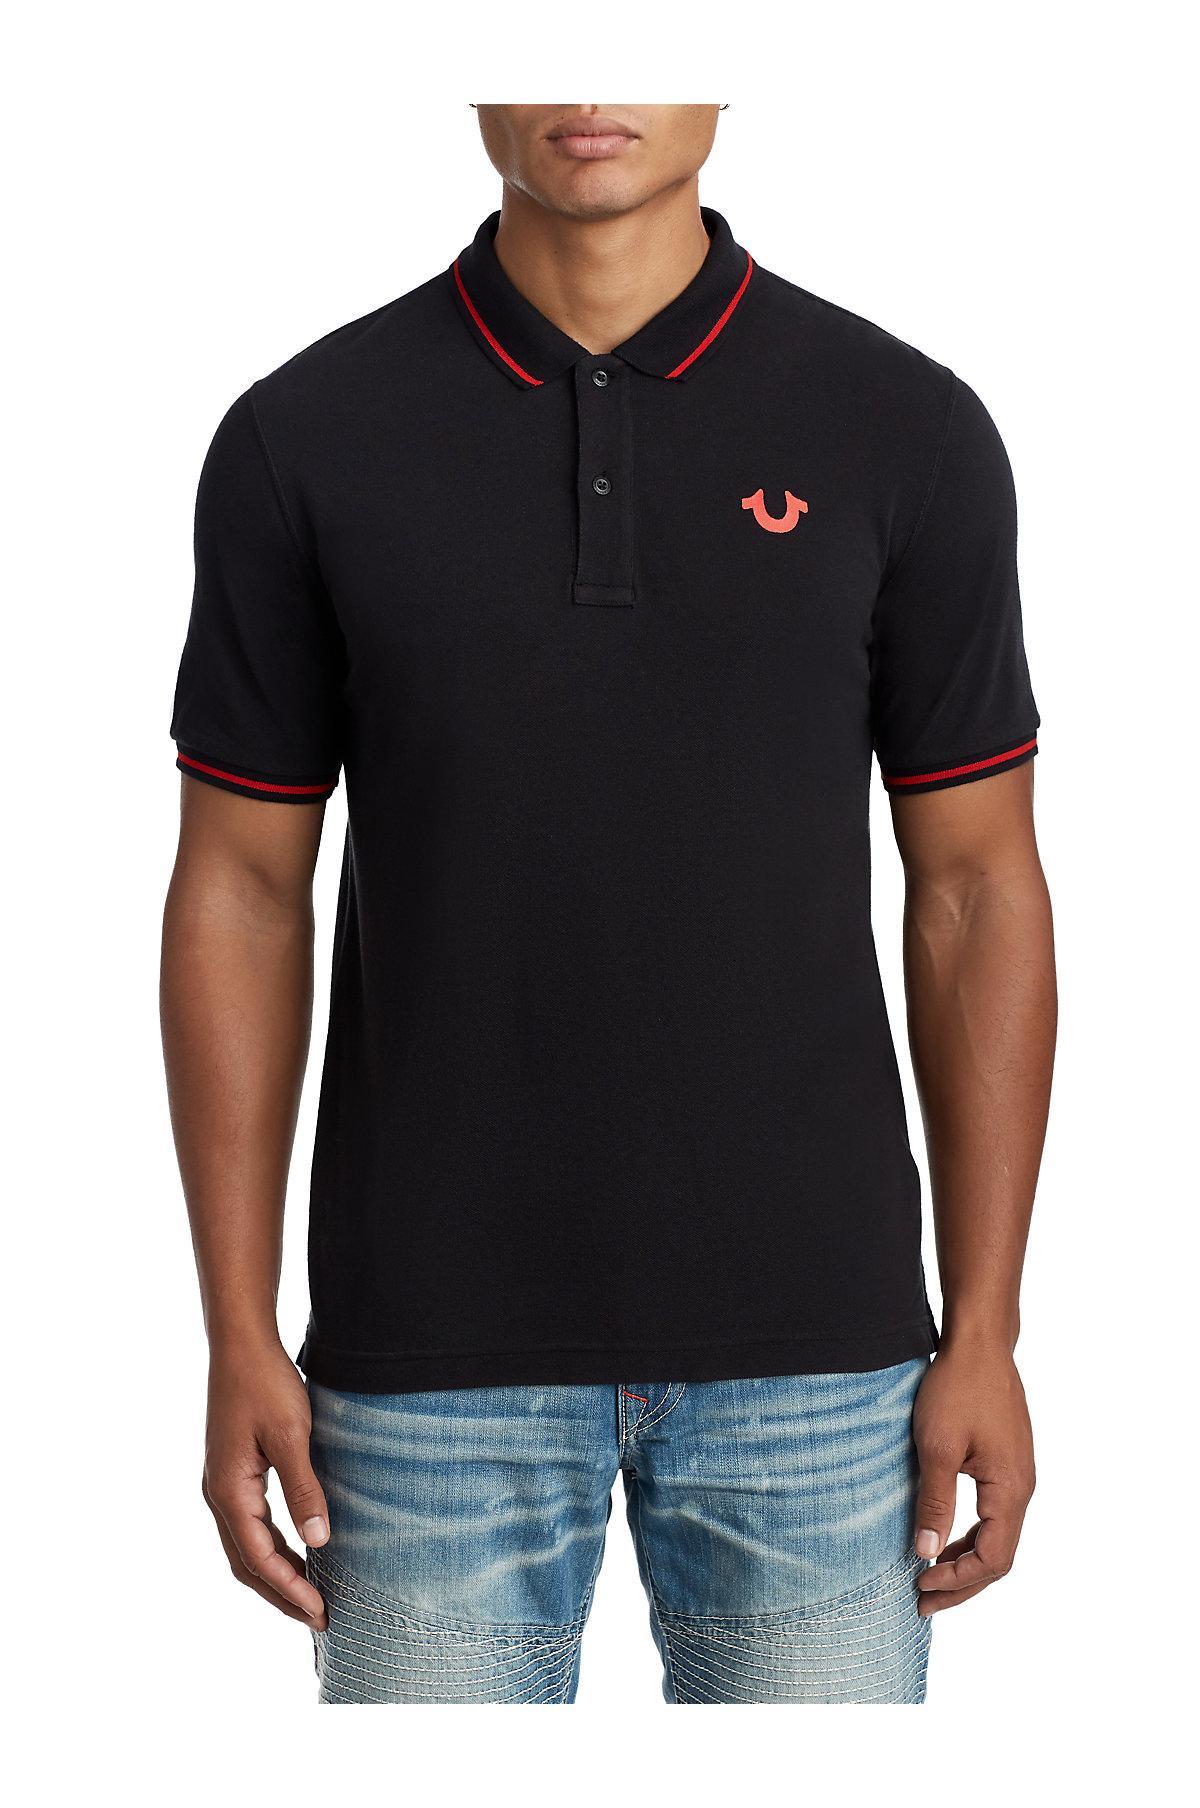 577e15f0 True Religion Classic Buddha Polo Shirt in Black for Men - Lyst